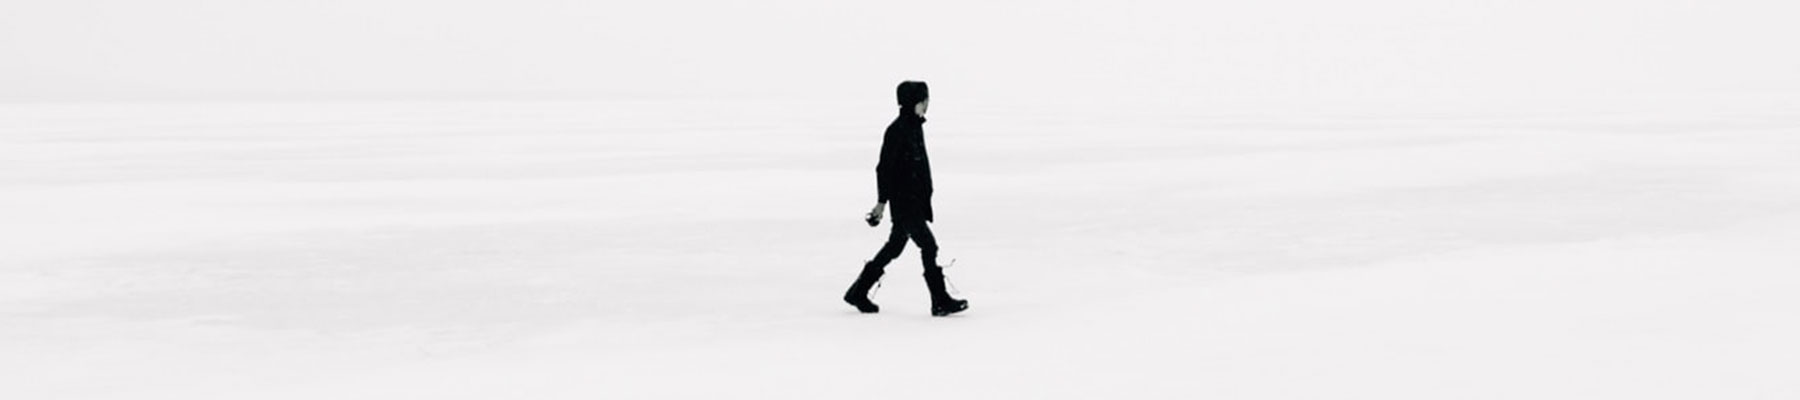 moderate drinking faq man walking